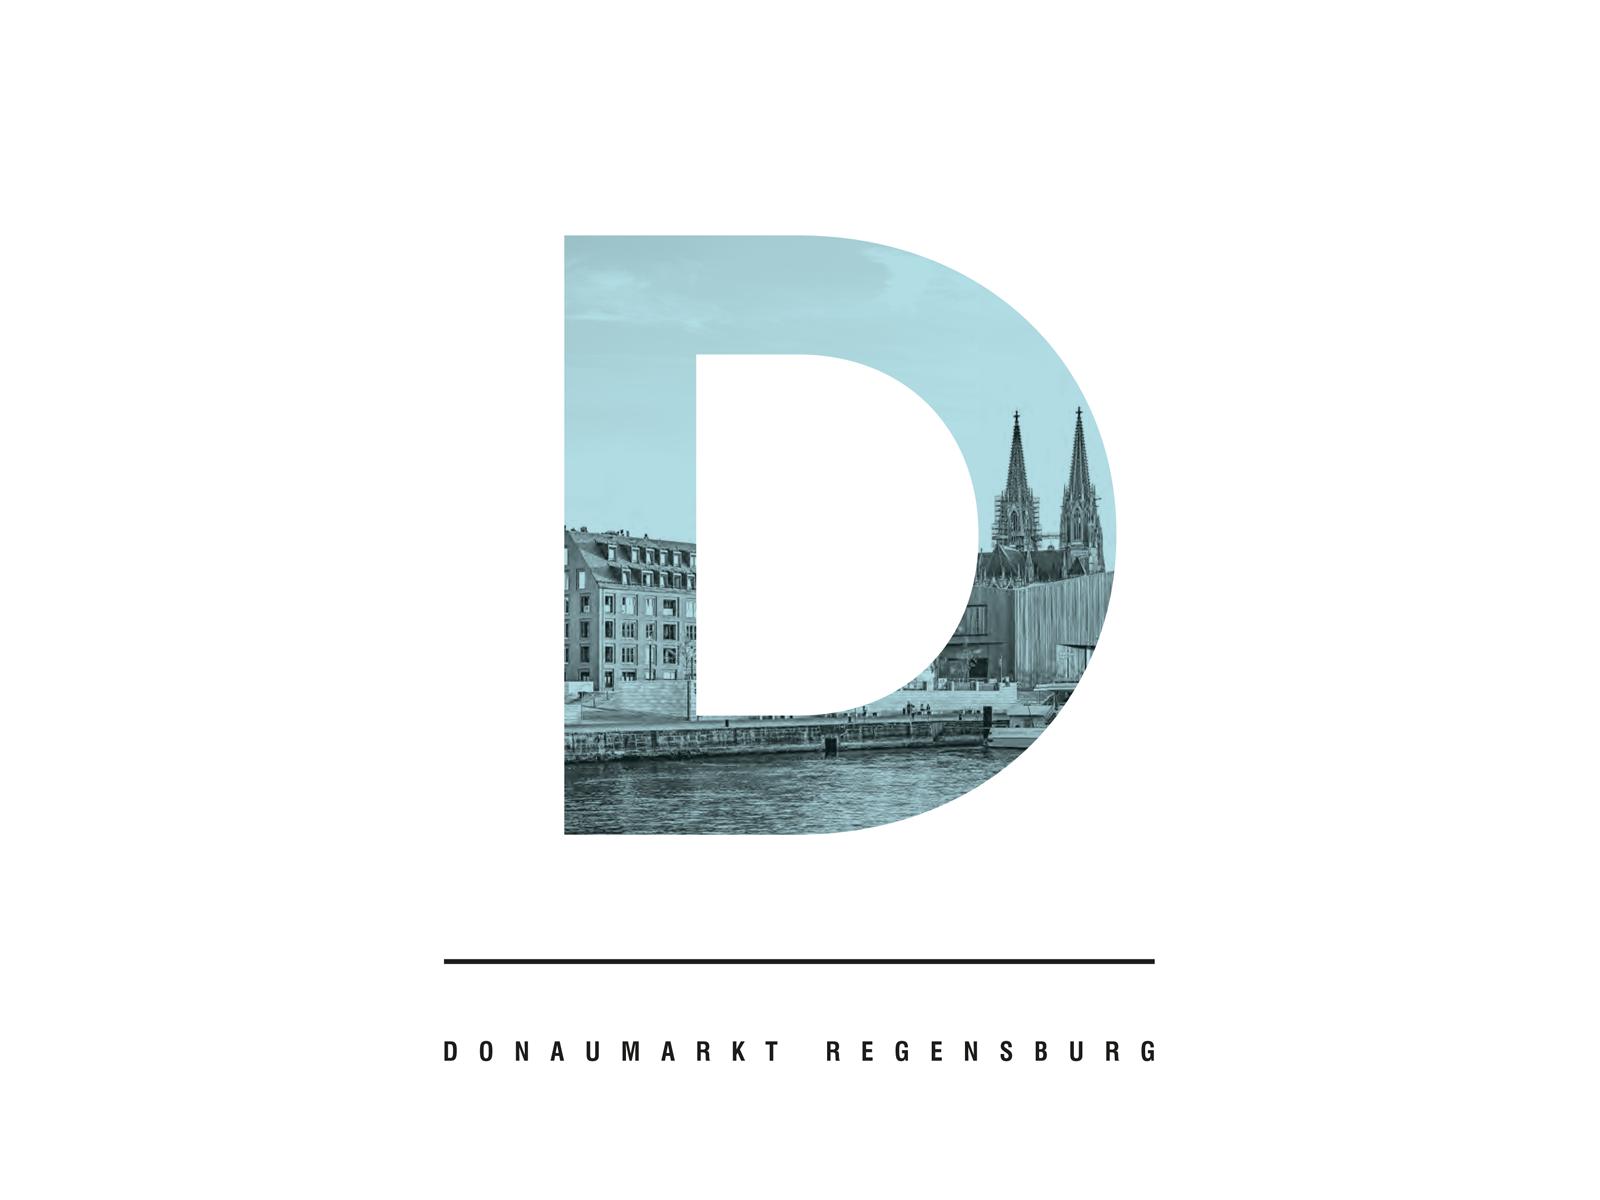 Donaumarkt Regensburg